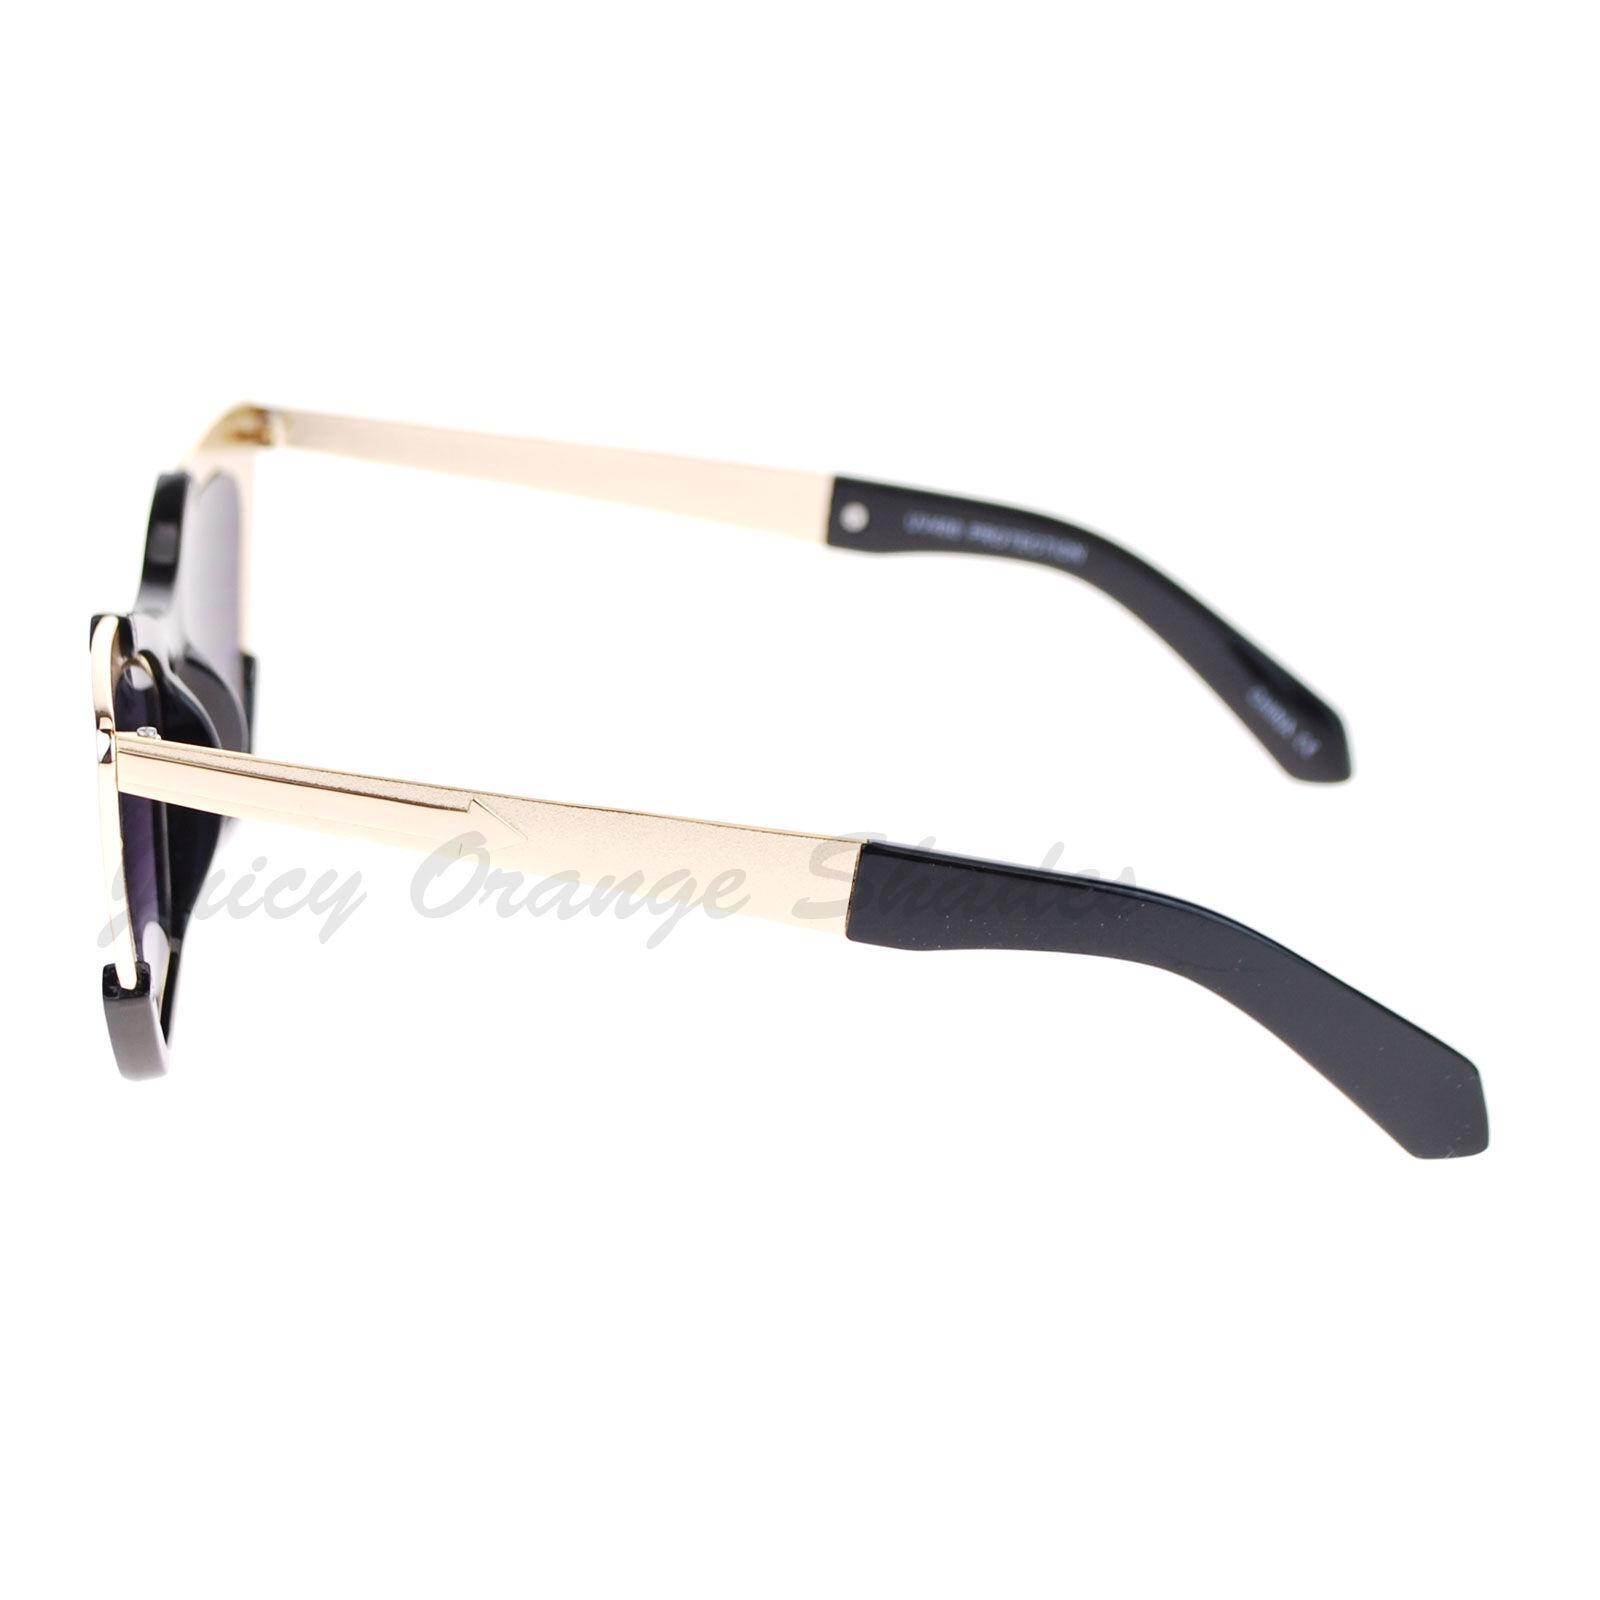 Retro Designer Sunglasses Trapezoid Cateye Runway Fashion Shades